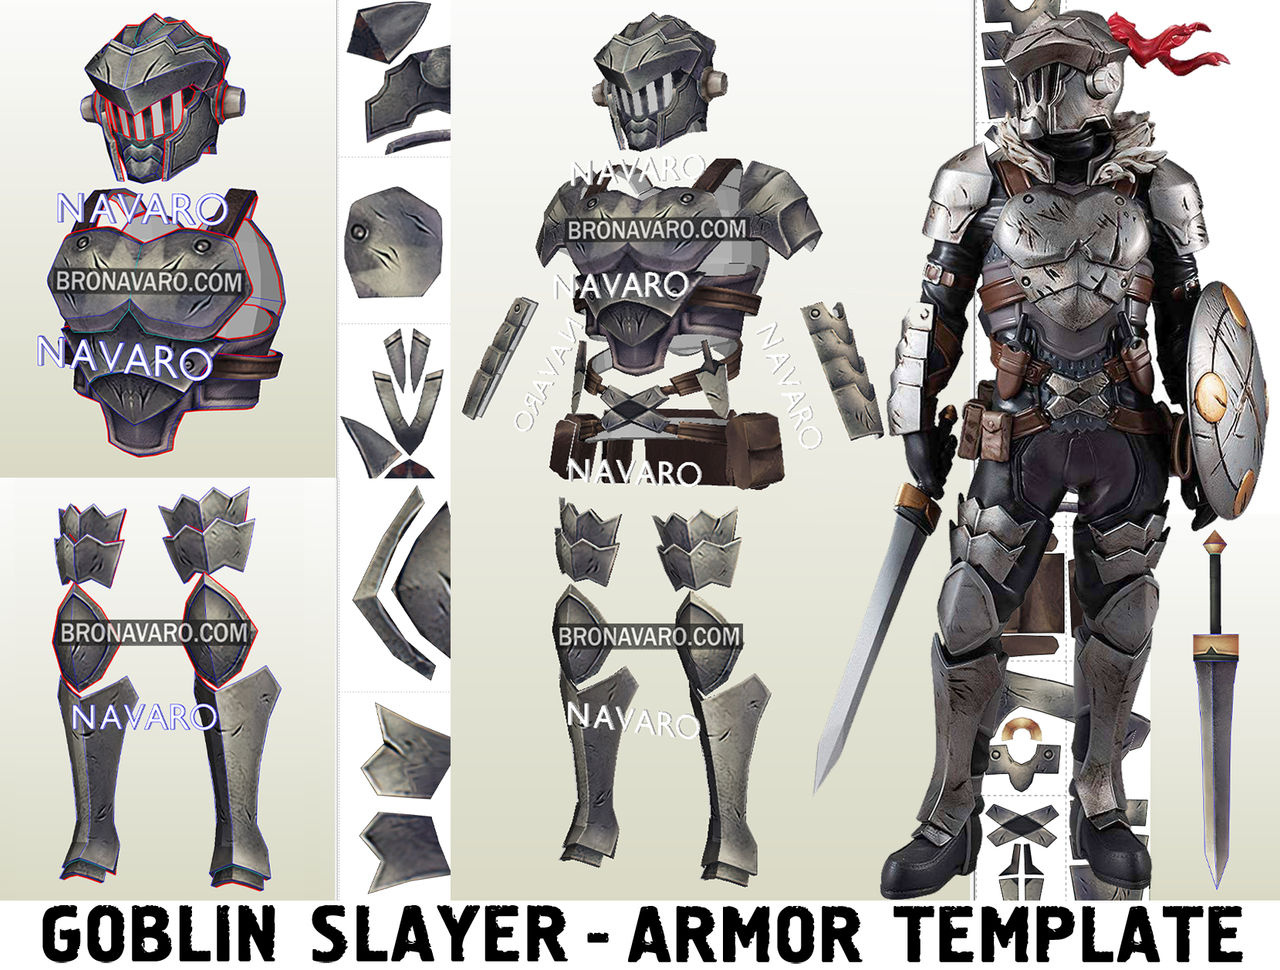 Goblin Slayer Cosplay Armor Eva Foam Template